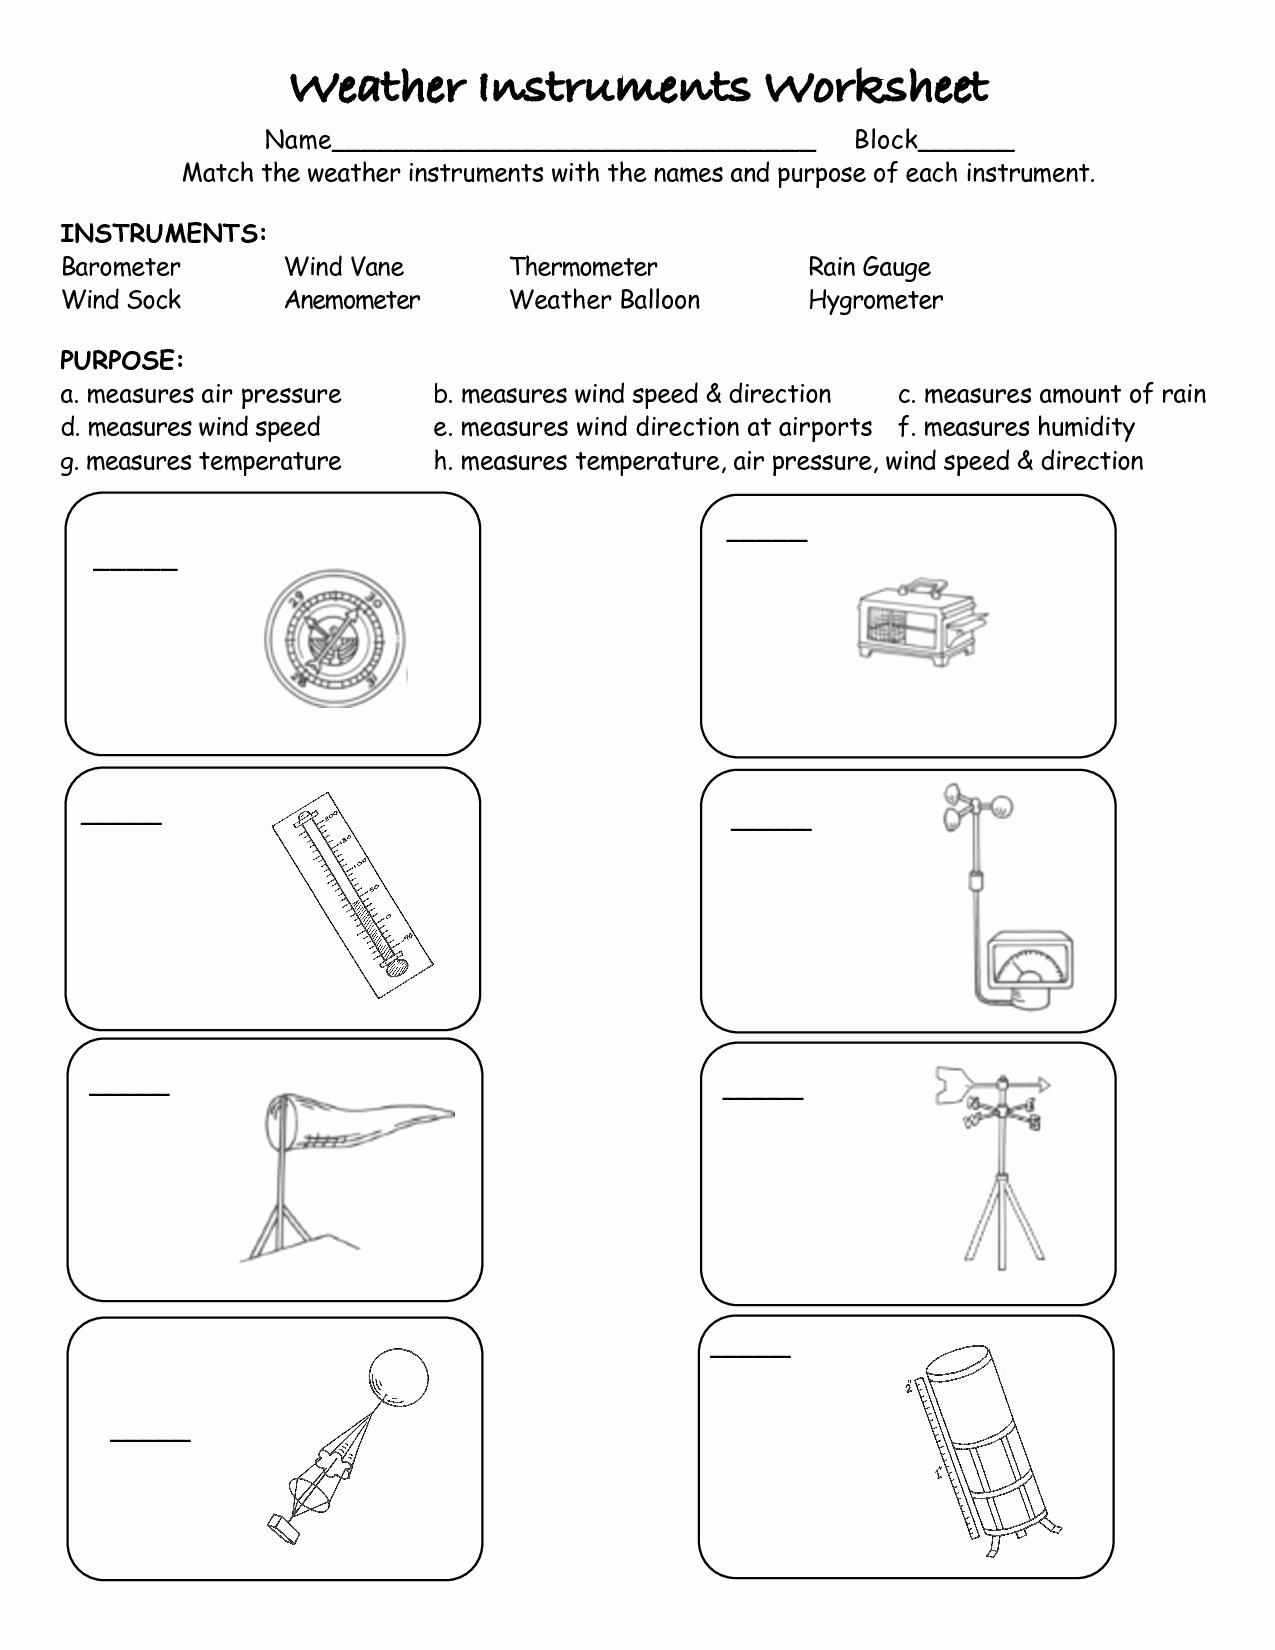 Weather tools Worksheet Unique Weather Instruments Printable Worksheets